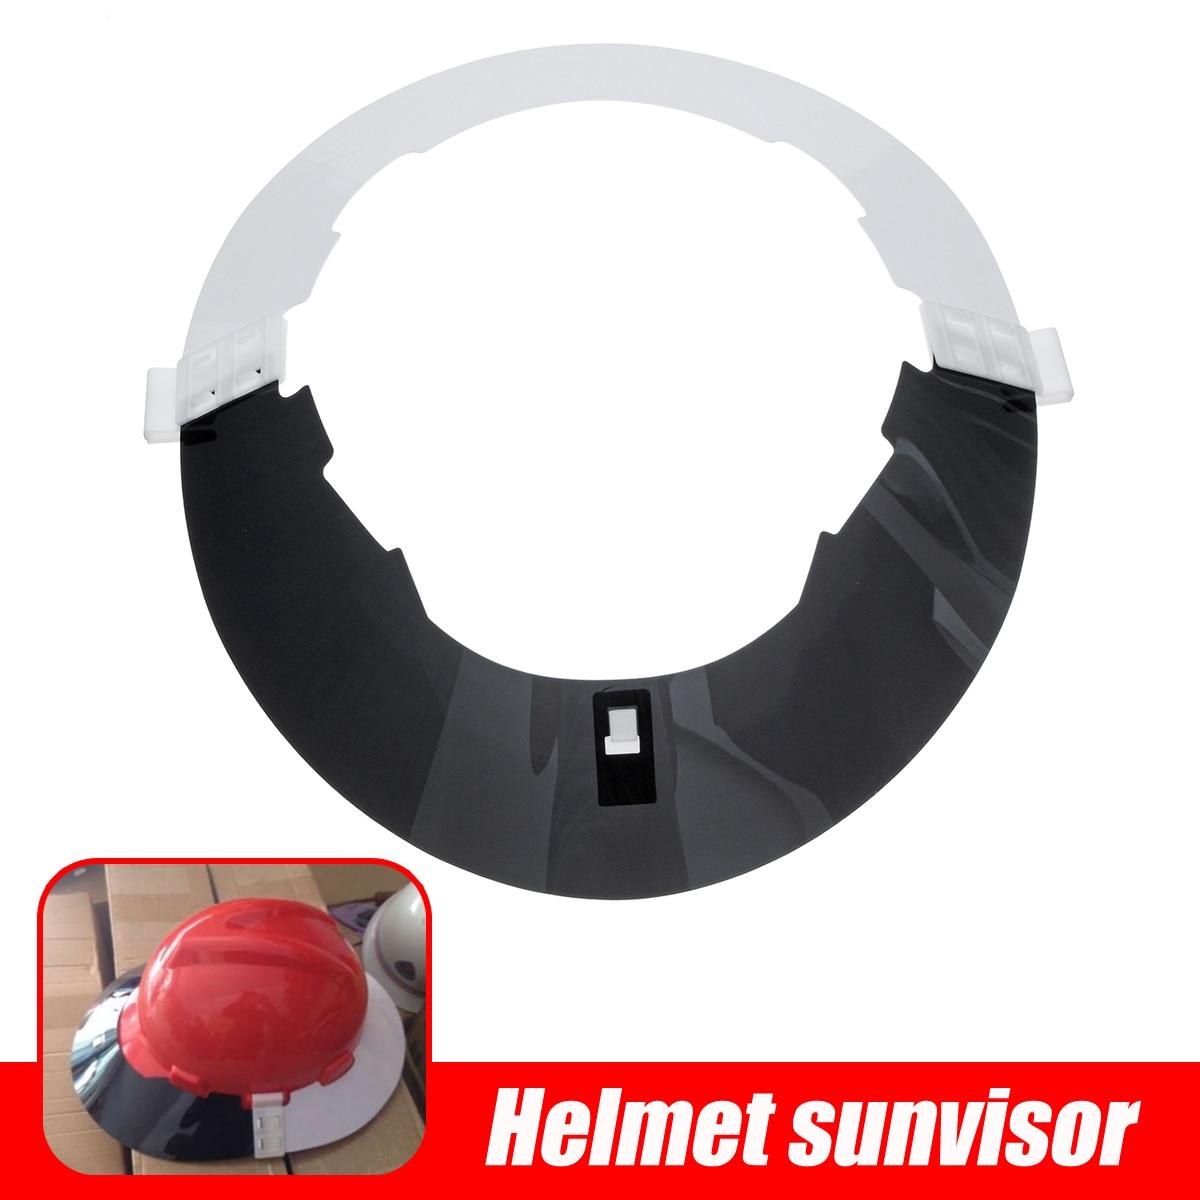 лучшая цена Safety Helmet Sunvisor Full Brim Hard Hat Sun Shield and Visor Hard Hat Visor High Light Transmission PC Flame Retardant Panel